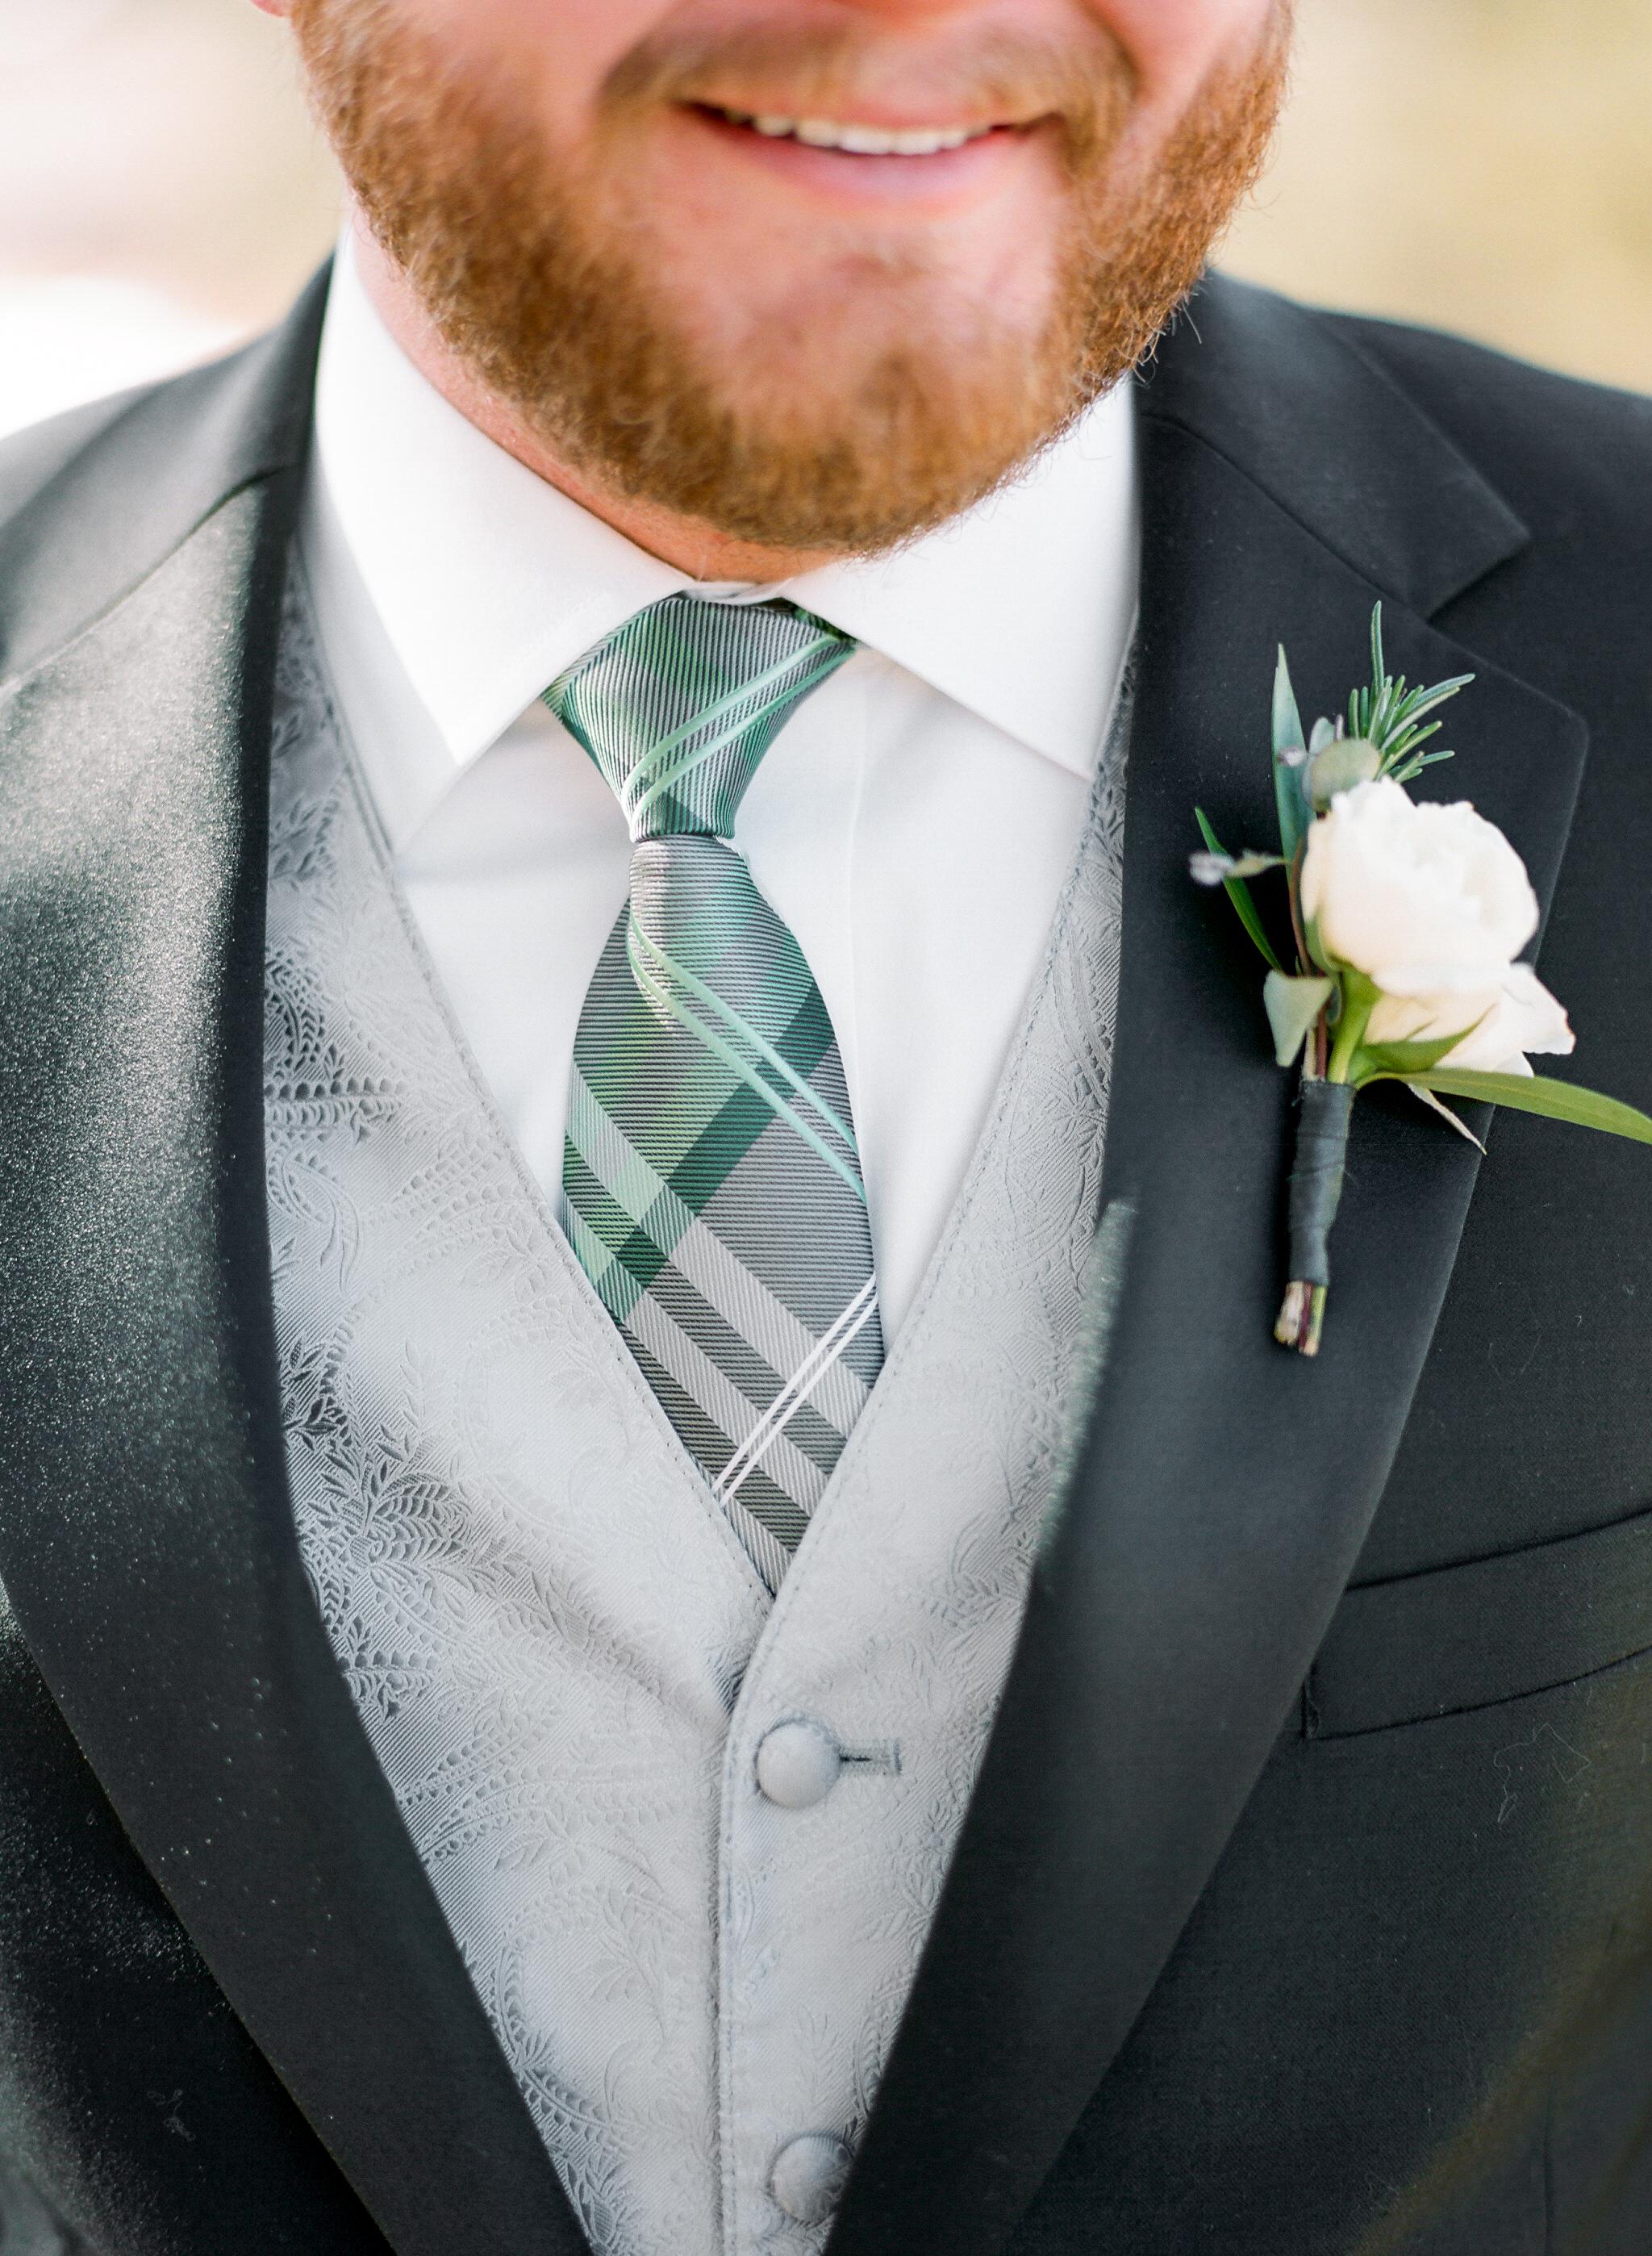 Twin_Owls_Steakhouse-wedding_photographer_Estes_Park_Lisa_ODwyer-701.jpg